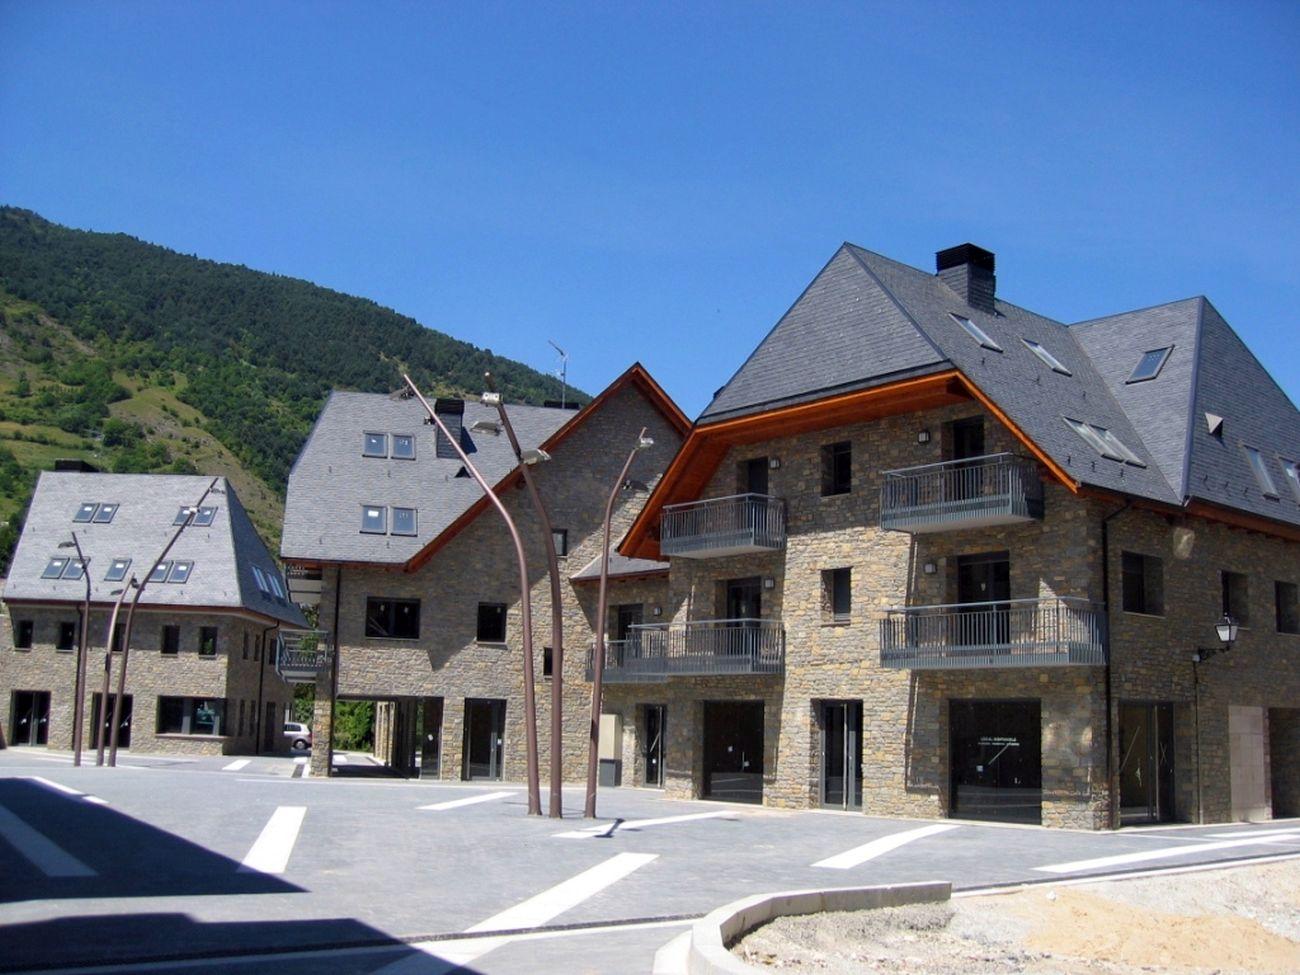 ADEMÀ CANELA COMELLA Arquitectes Associats S.L.P: Conjunto residencial de 32 viviendas en Vielha